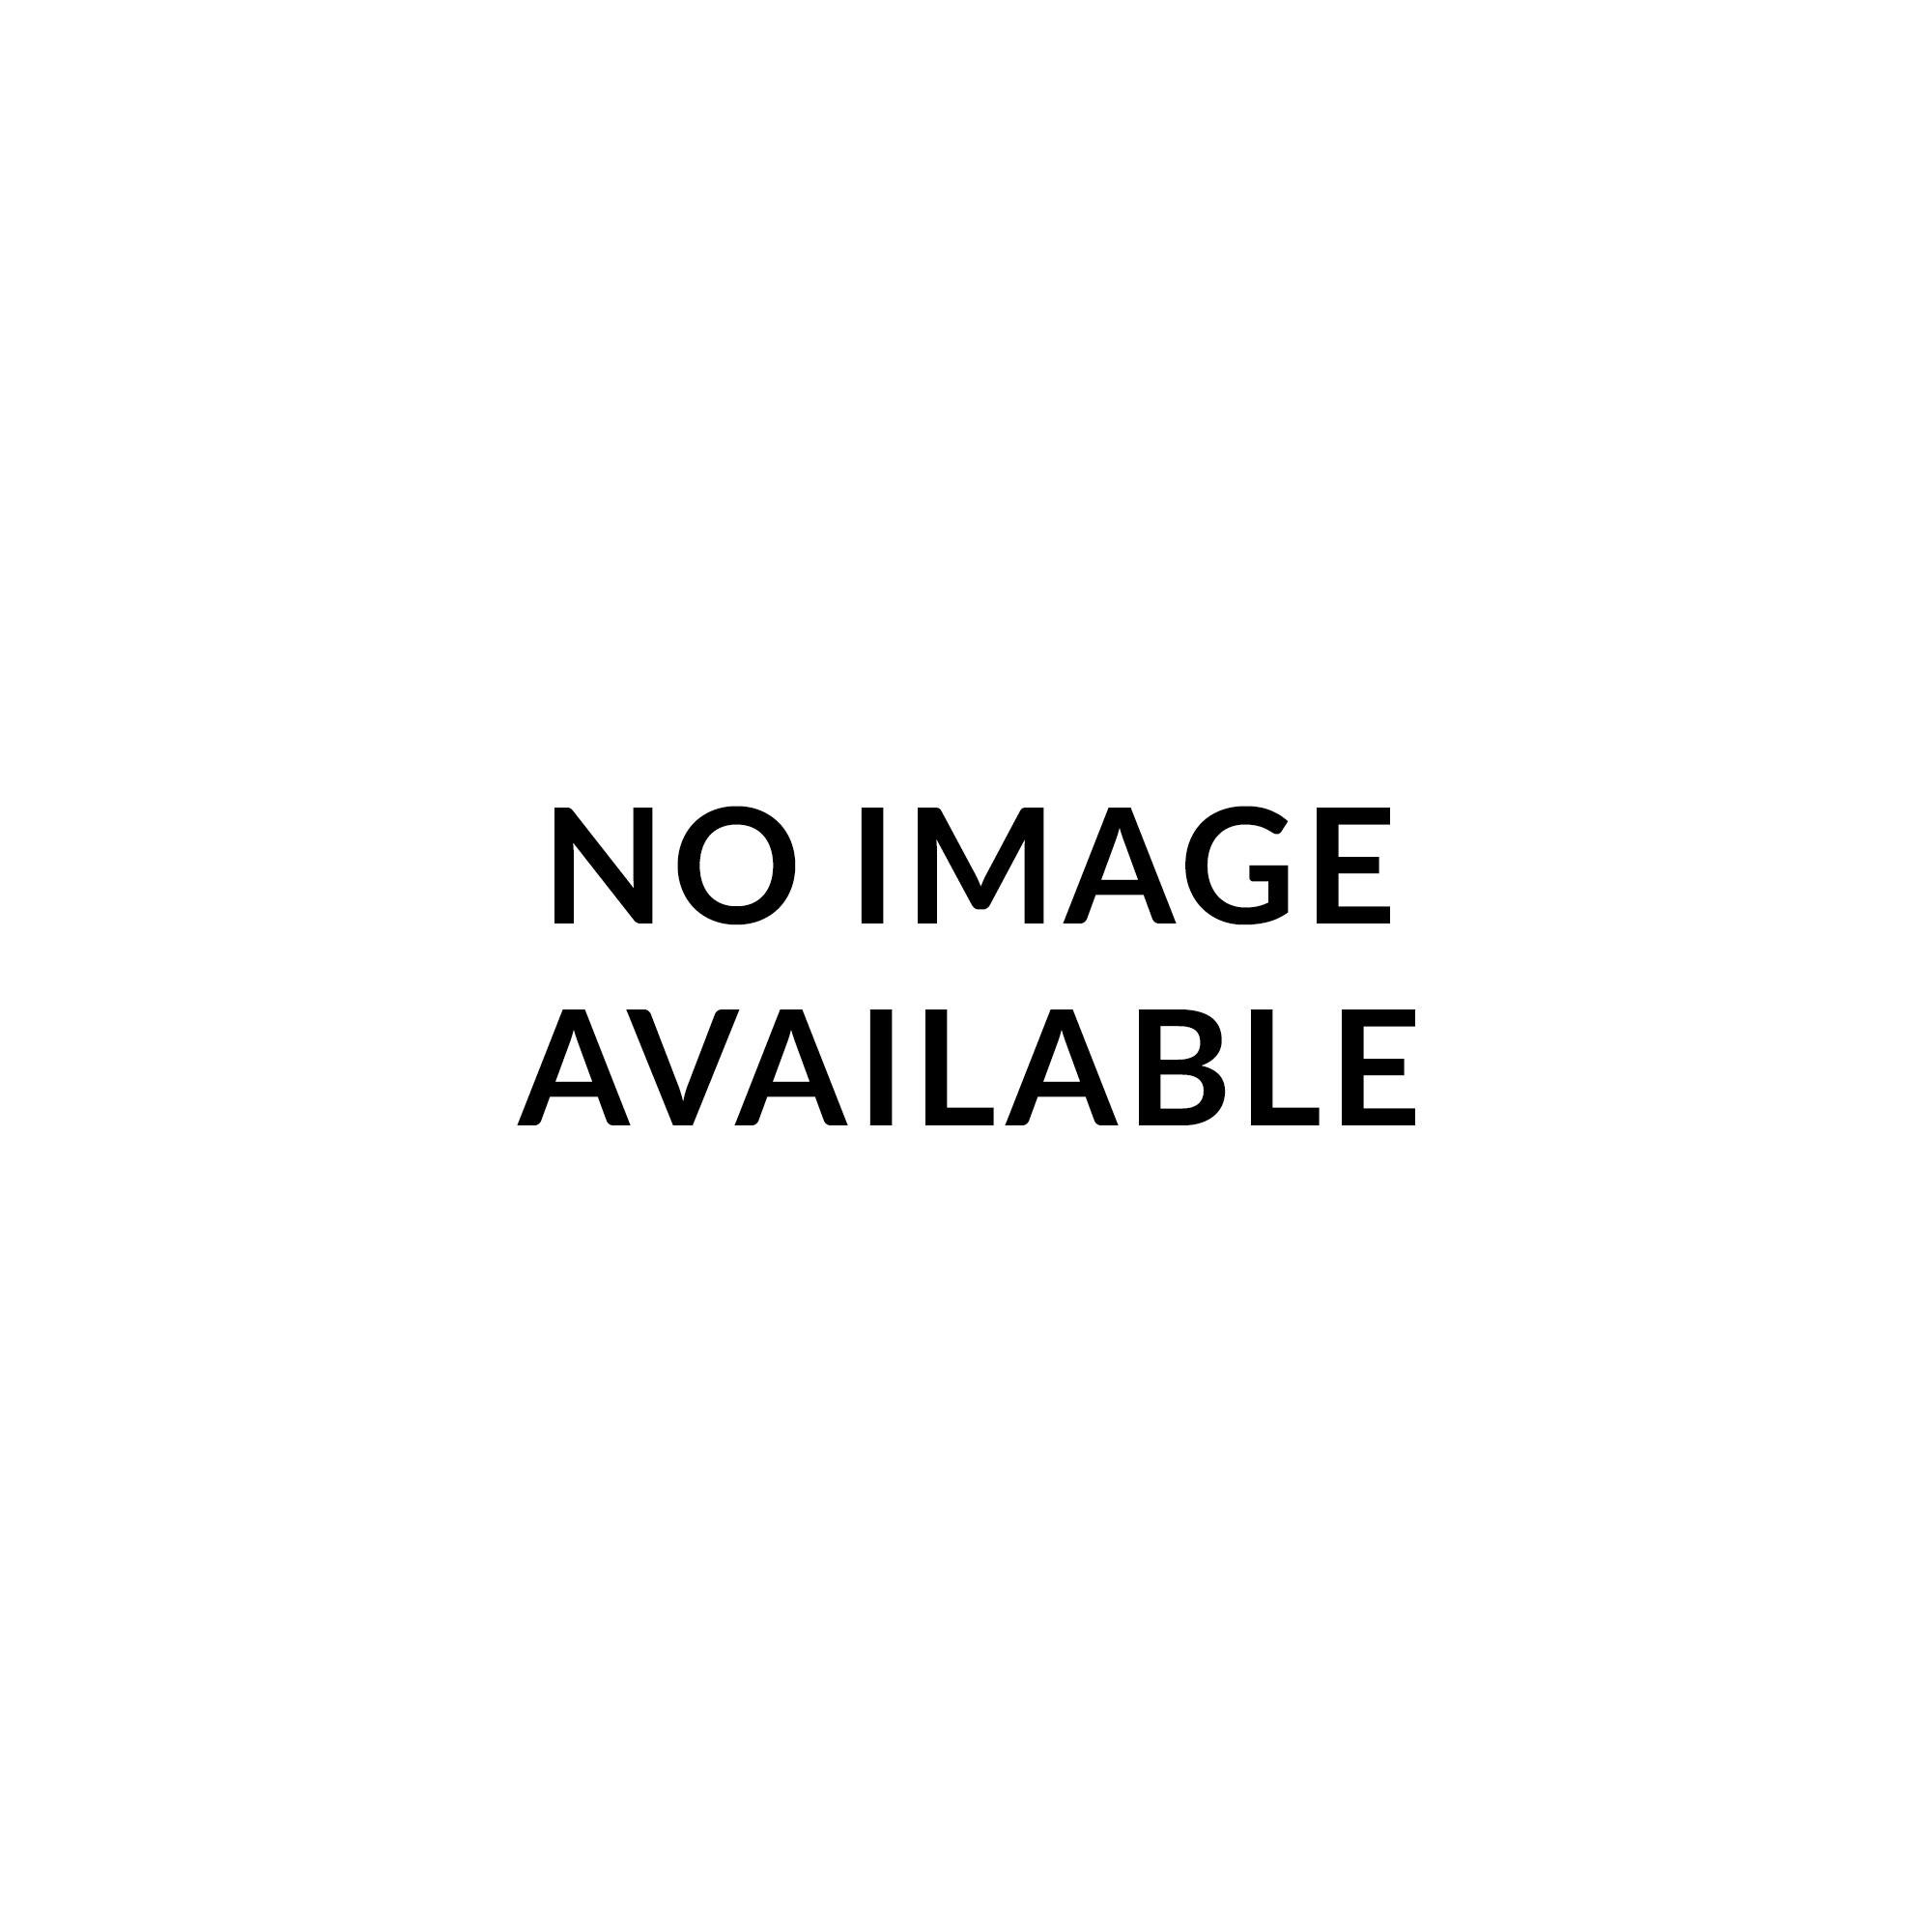 Seymour Duncan Fully Loaded Pickguard for Strat, Black, No Pickups